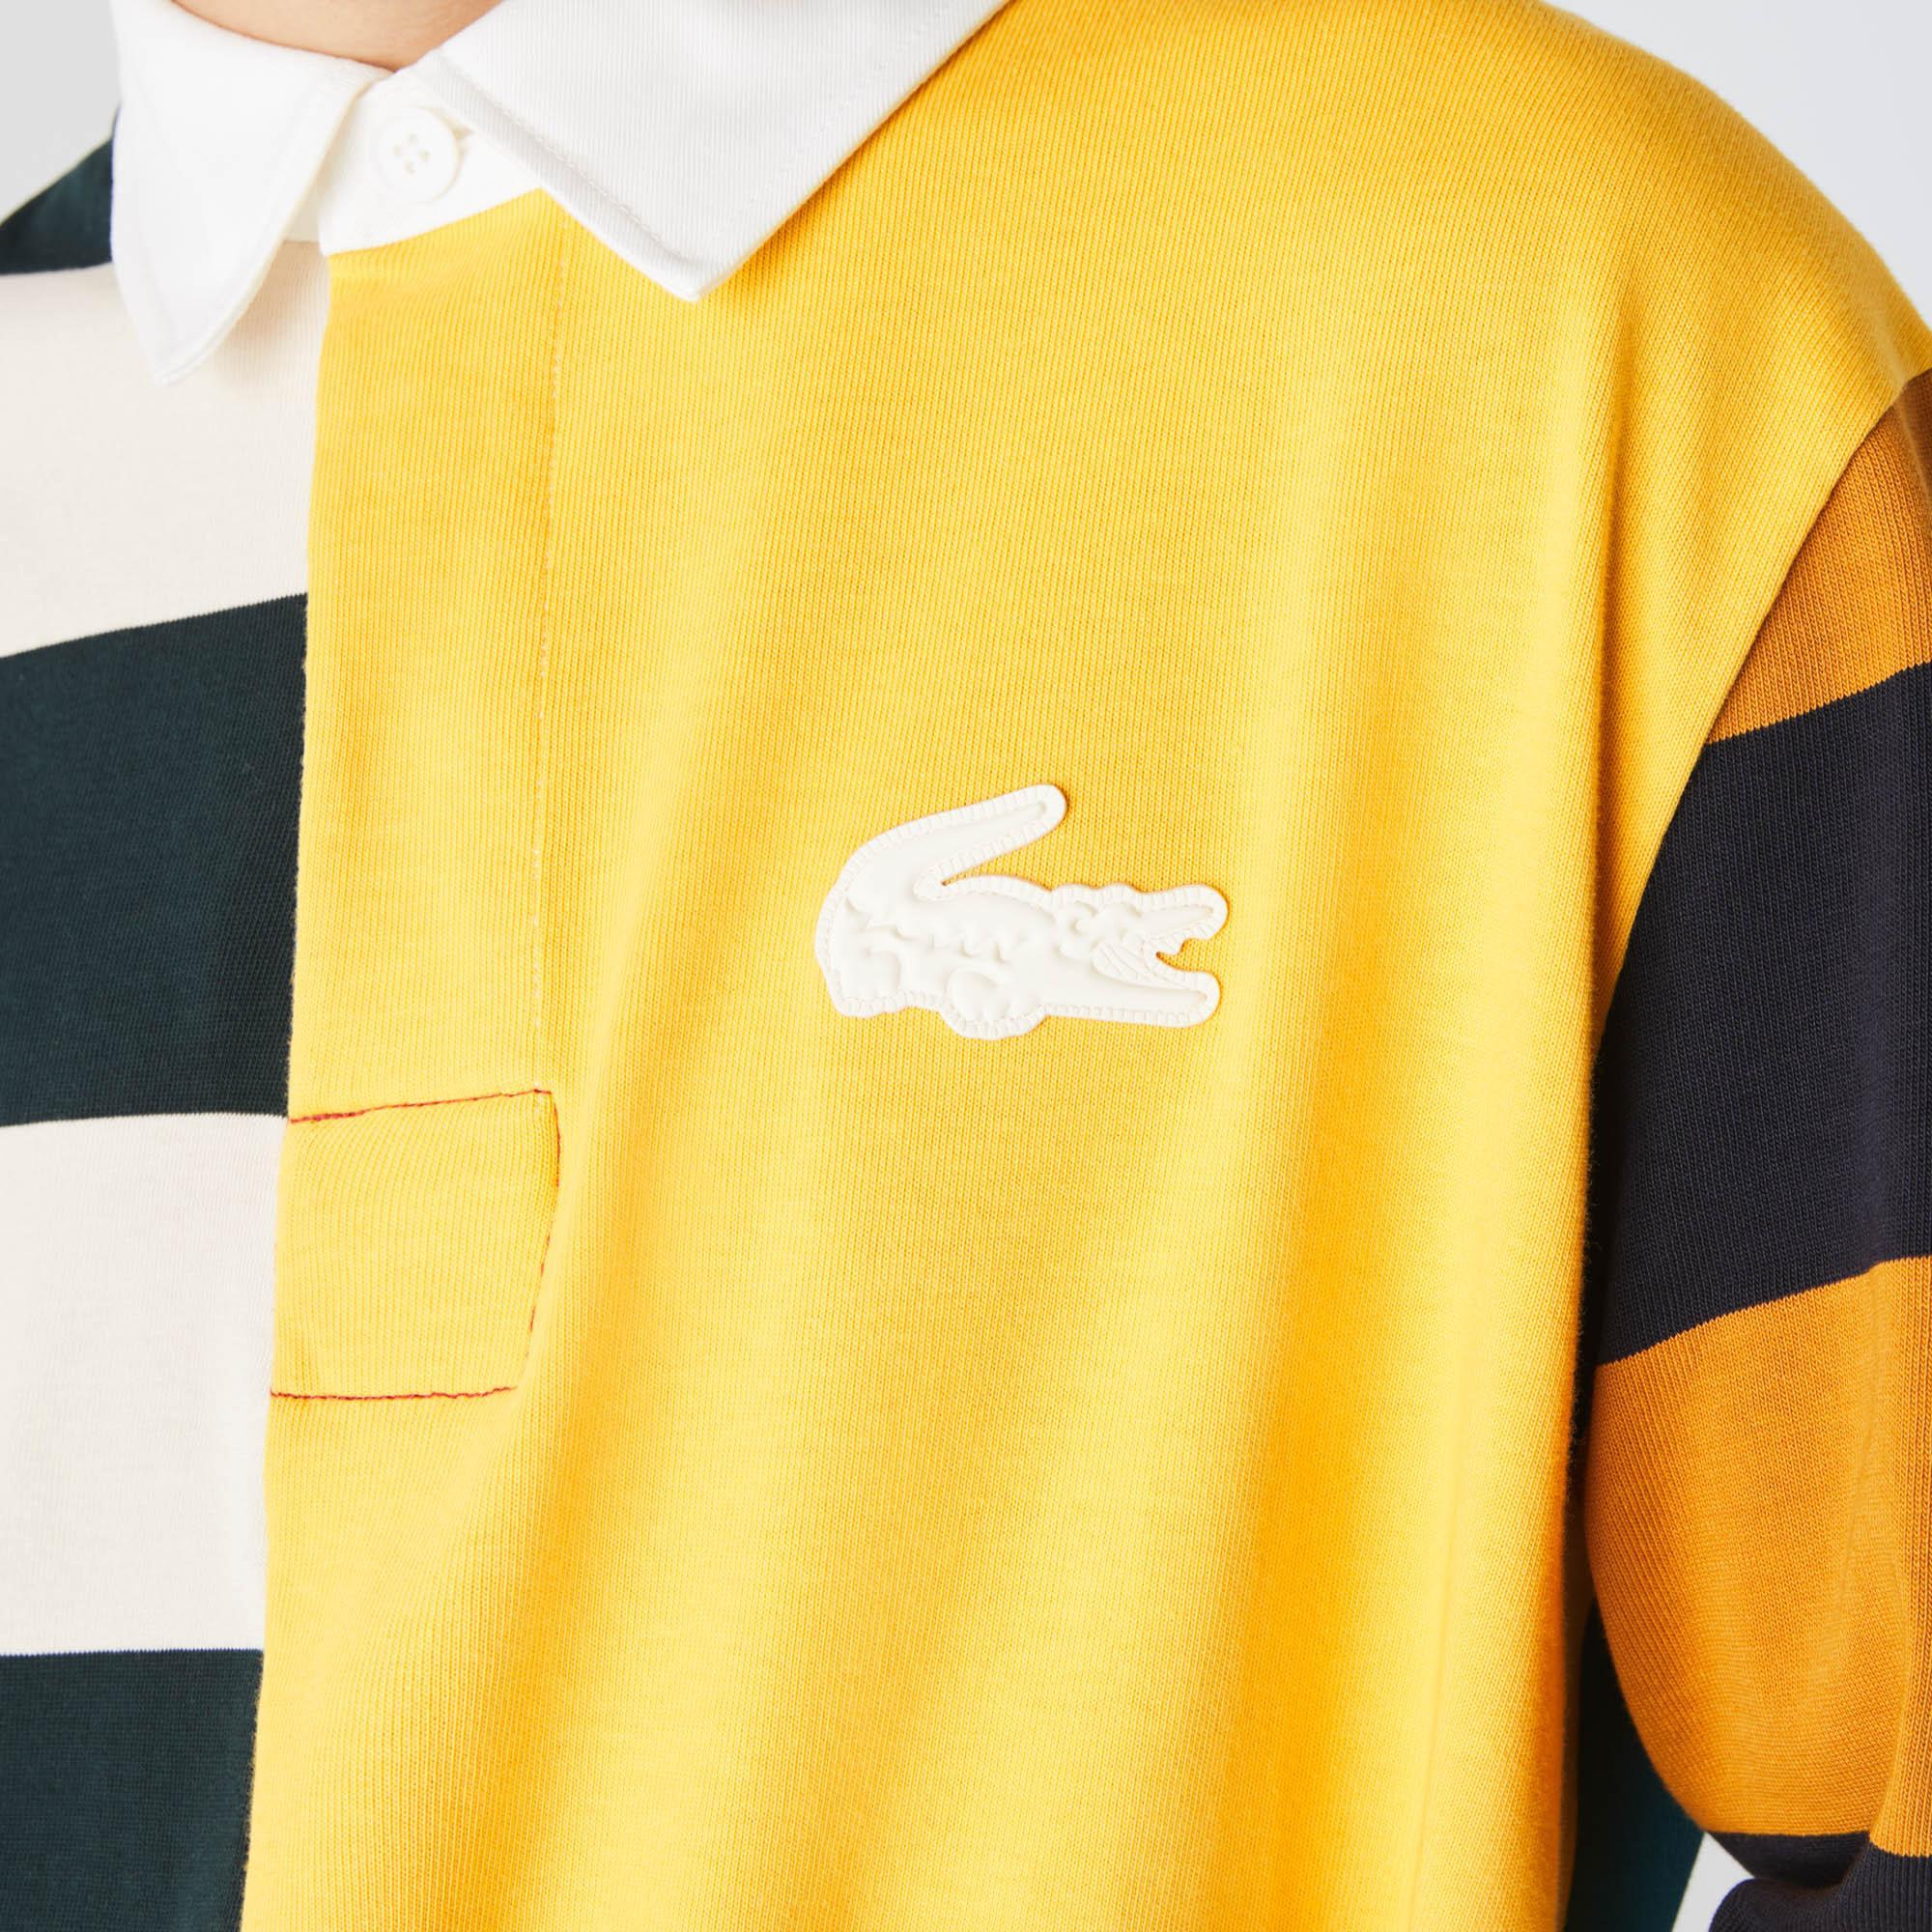 Lacoste L!VE Men's Loose Fit Colourblock Cotton Rugby Style Polo Shirt